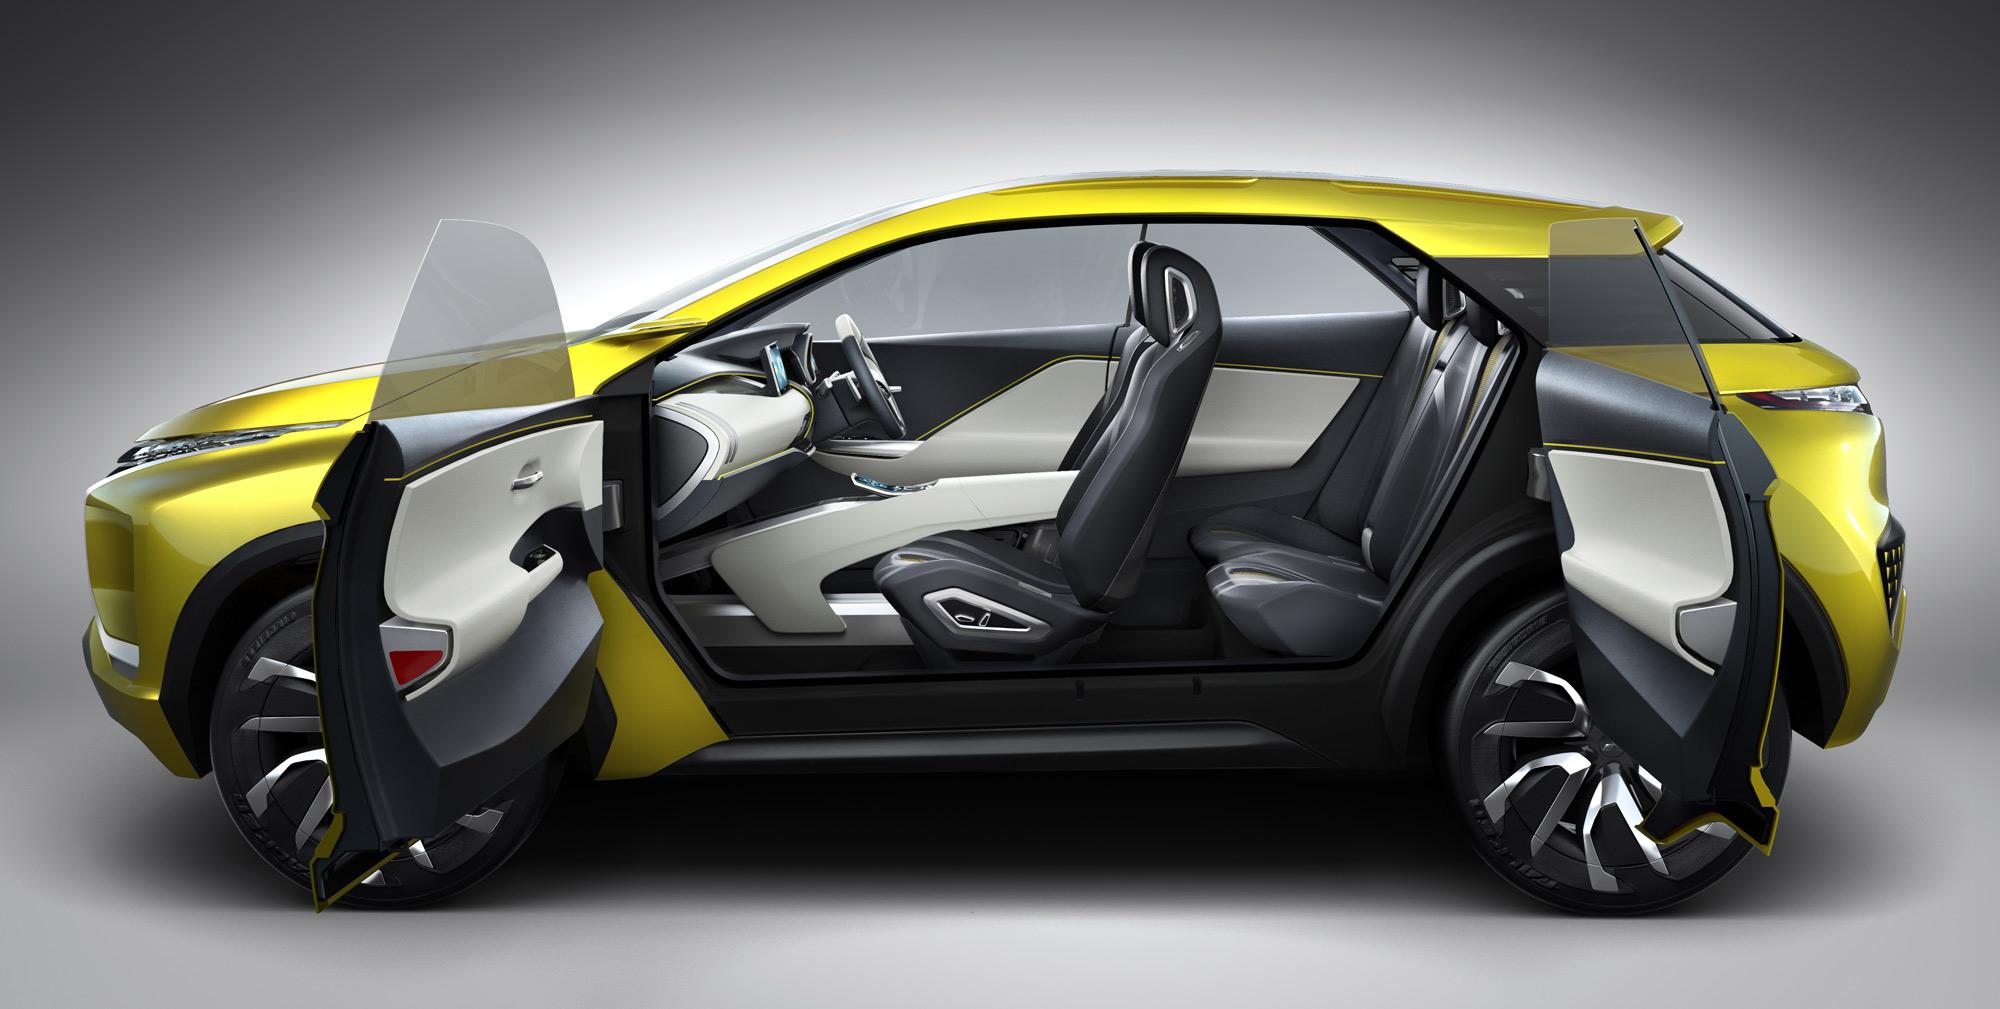 Mitsubishi Ex Concept interior